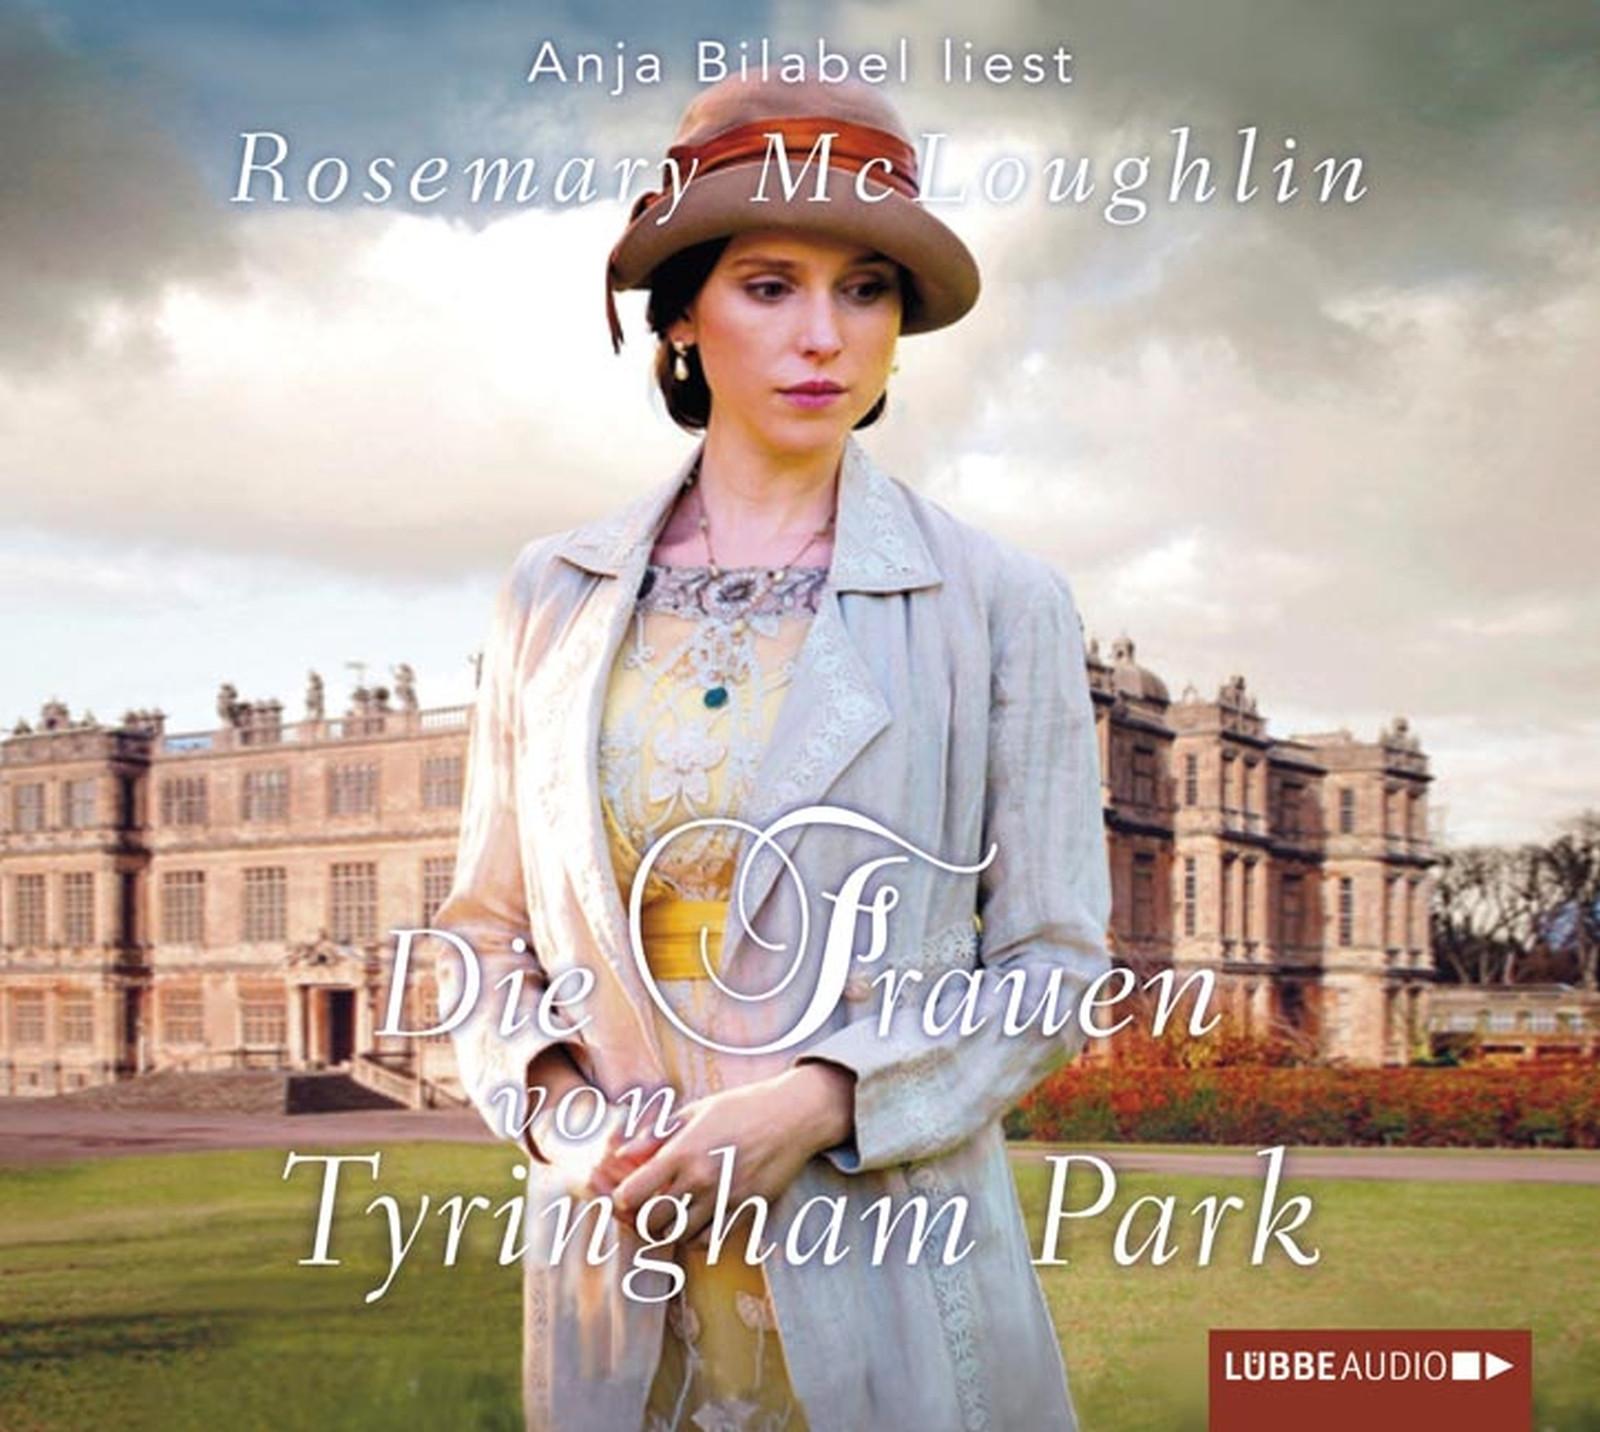 Rosemary McLoughlin - Die Frauen von Tyringham Park